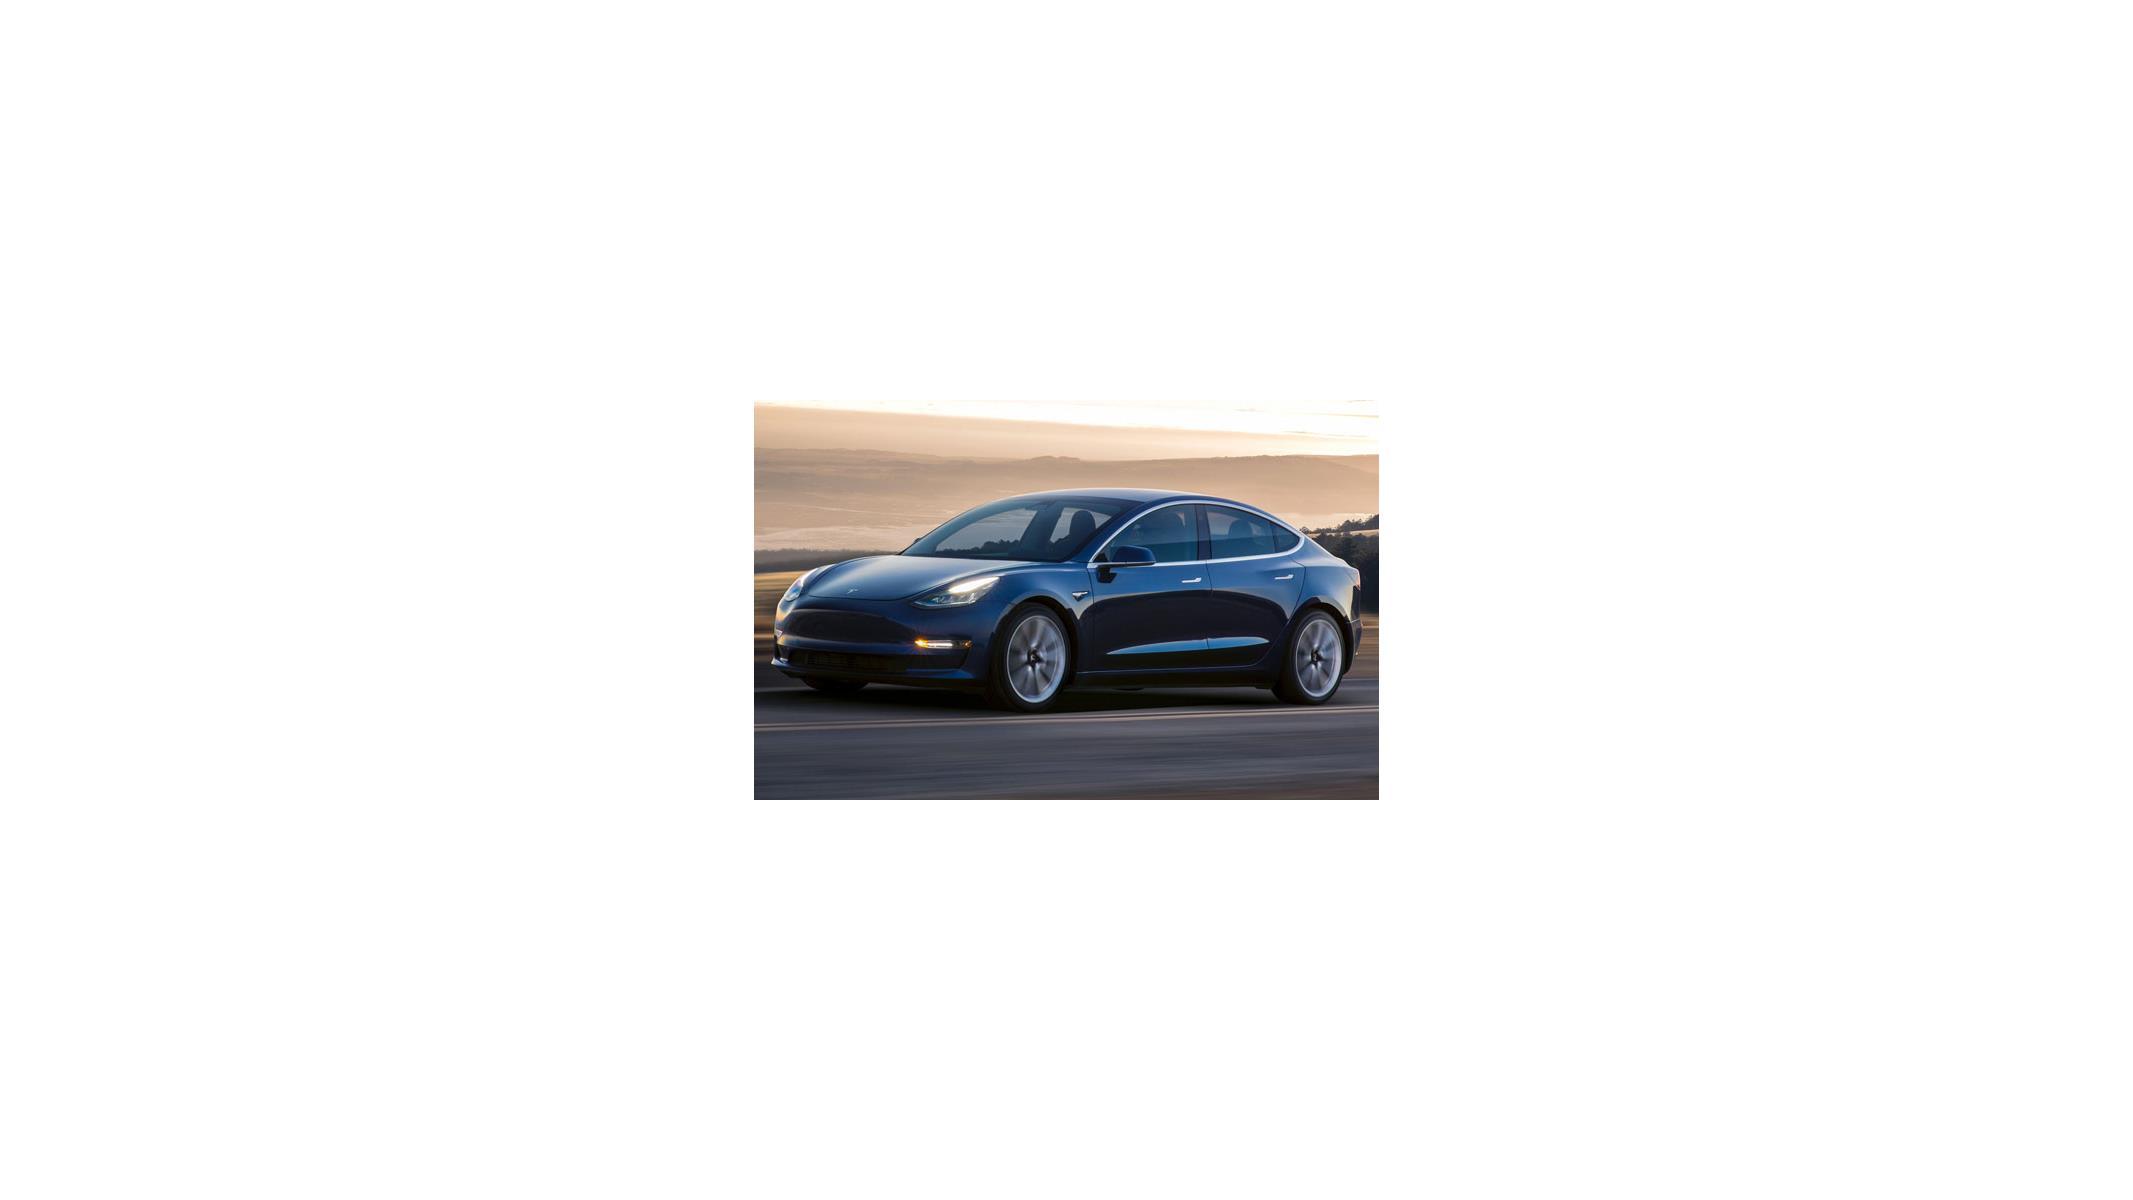 Tesla Ramps Model 3 Production, Smokin' Performance Dual